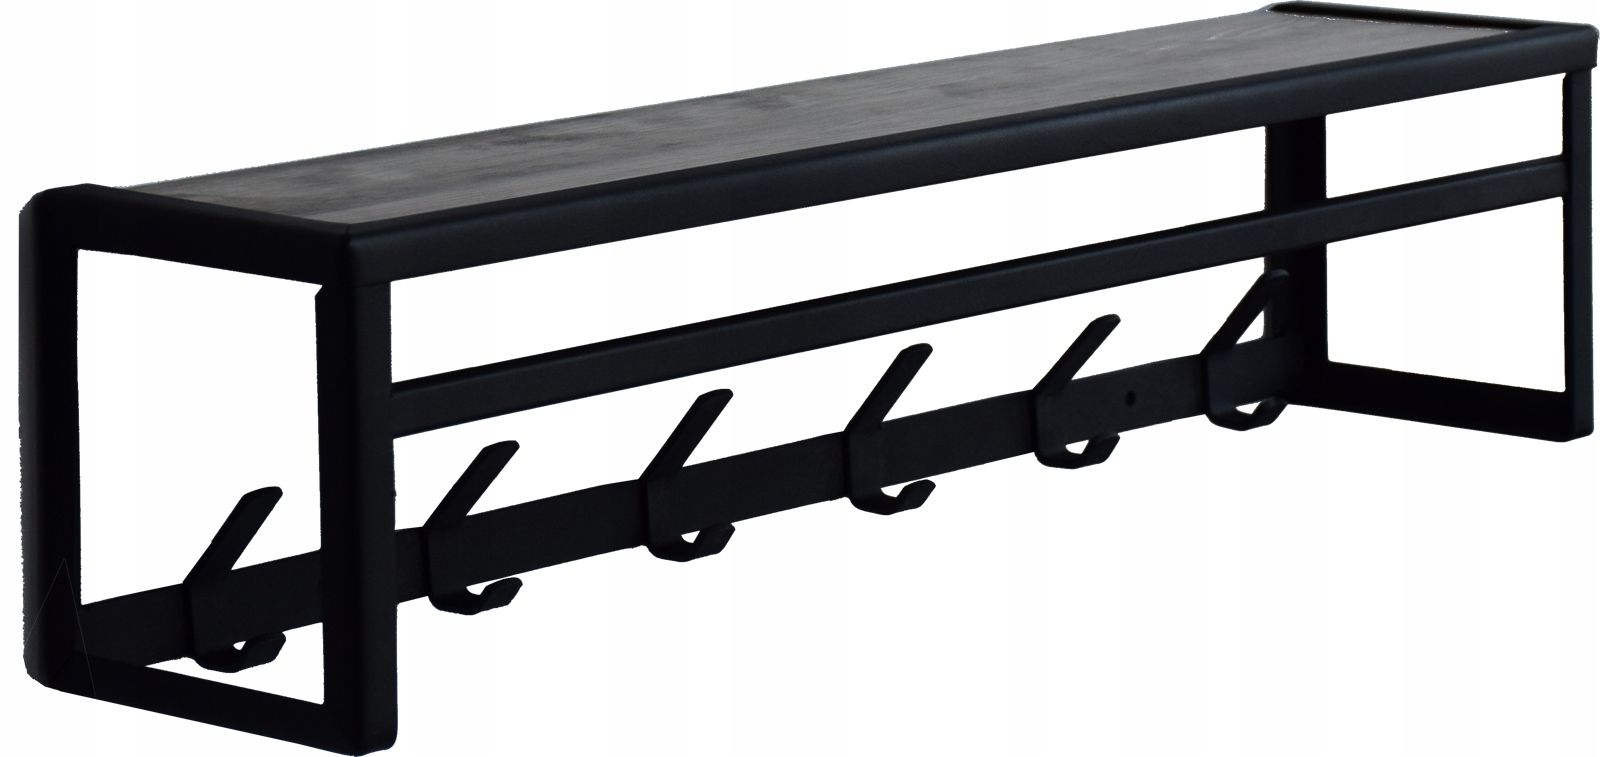 Garderoba Wieszak Loft Industrial Rustykalny 80cm 8716297295 Oficjalne Archiwum Allegro Decor Home Decor Furniture